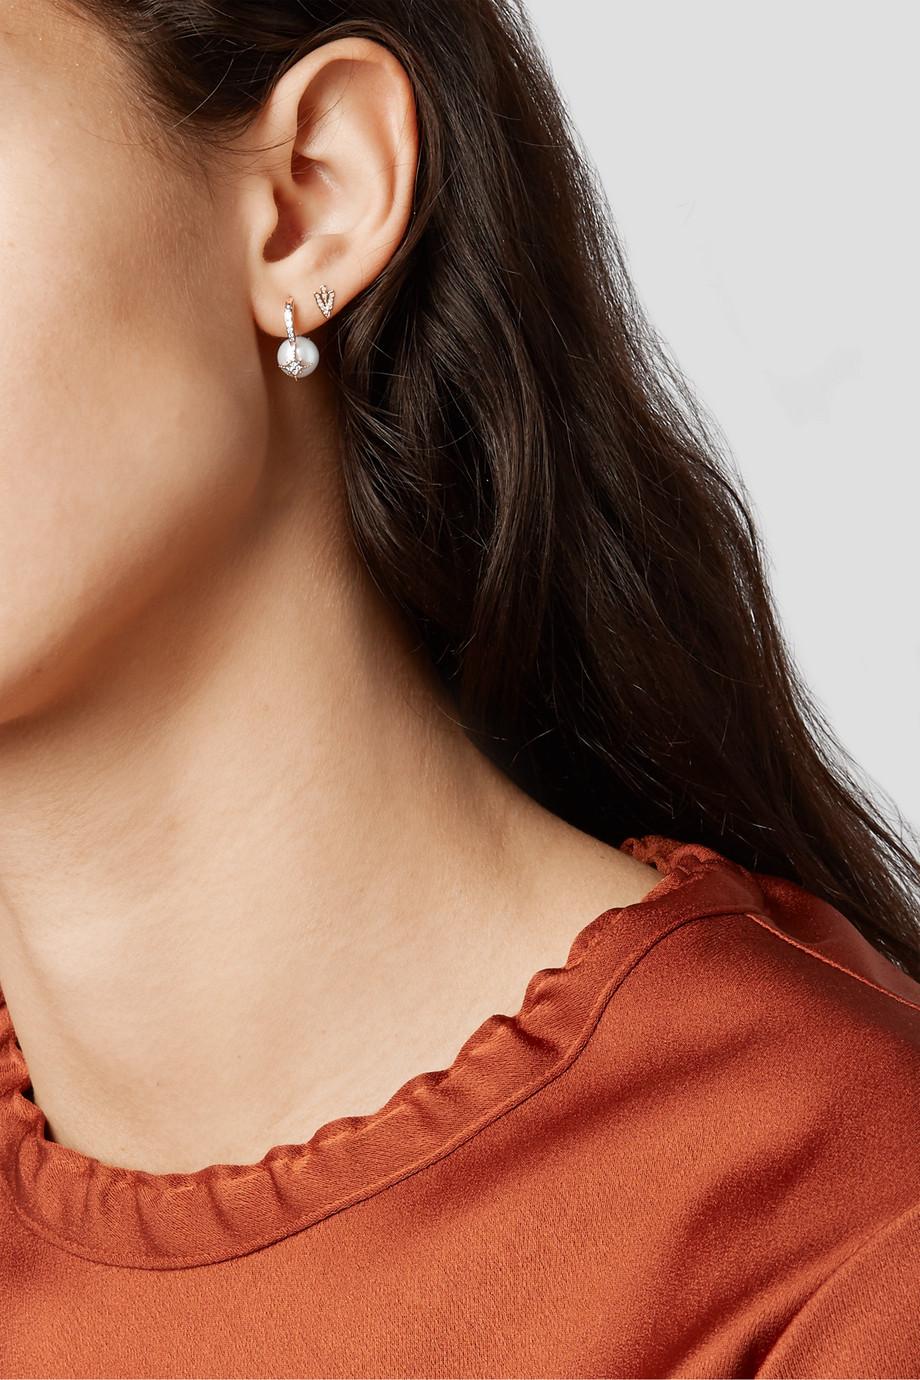 Sydney Evan Starburst 14-karat gold, pearl and diamond earrings